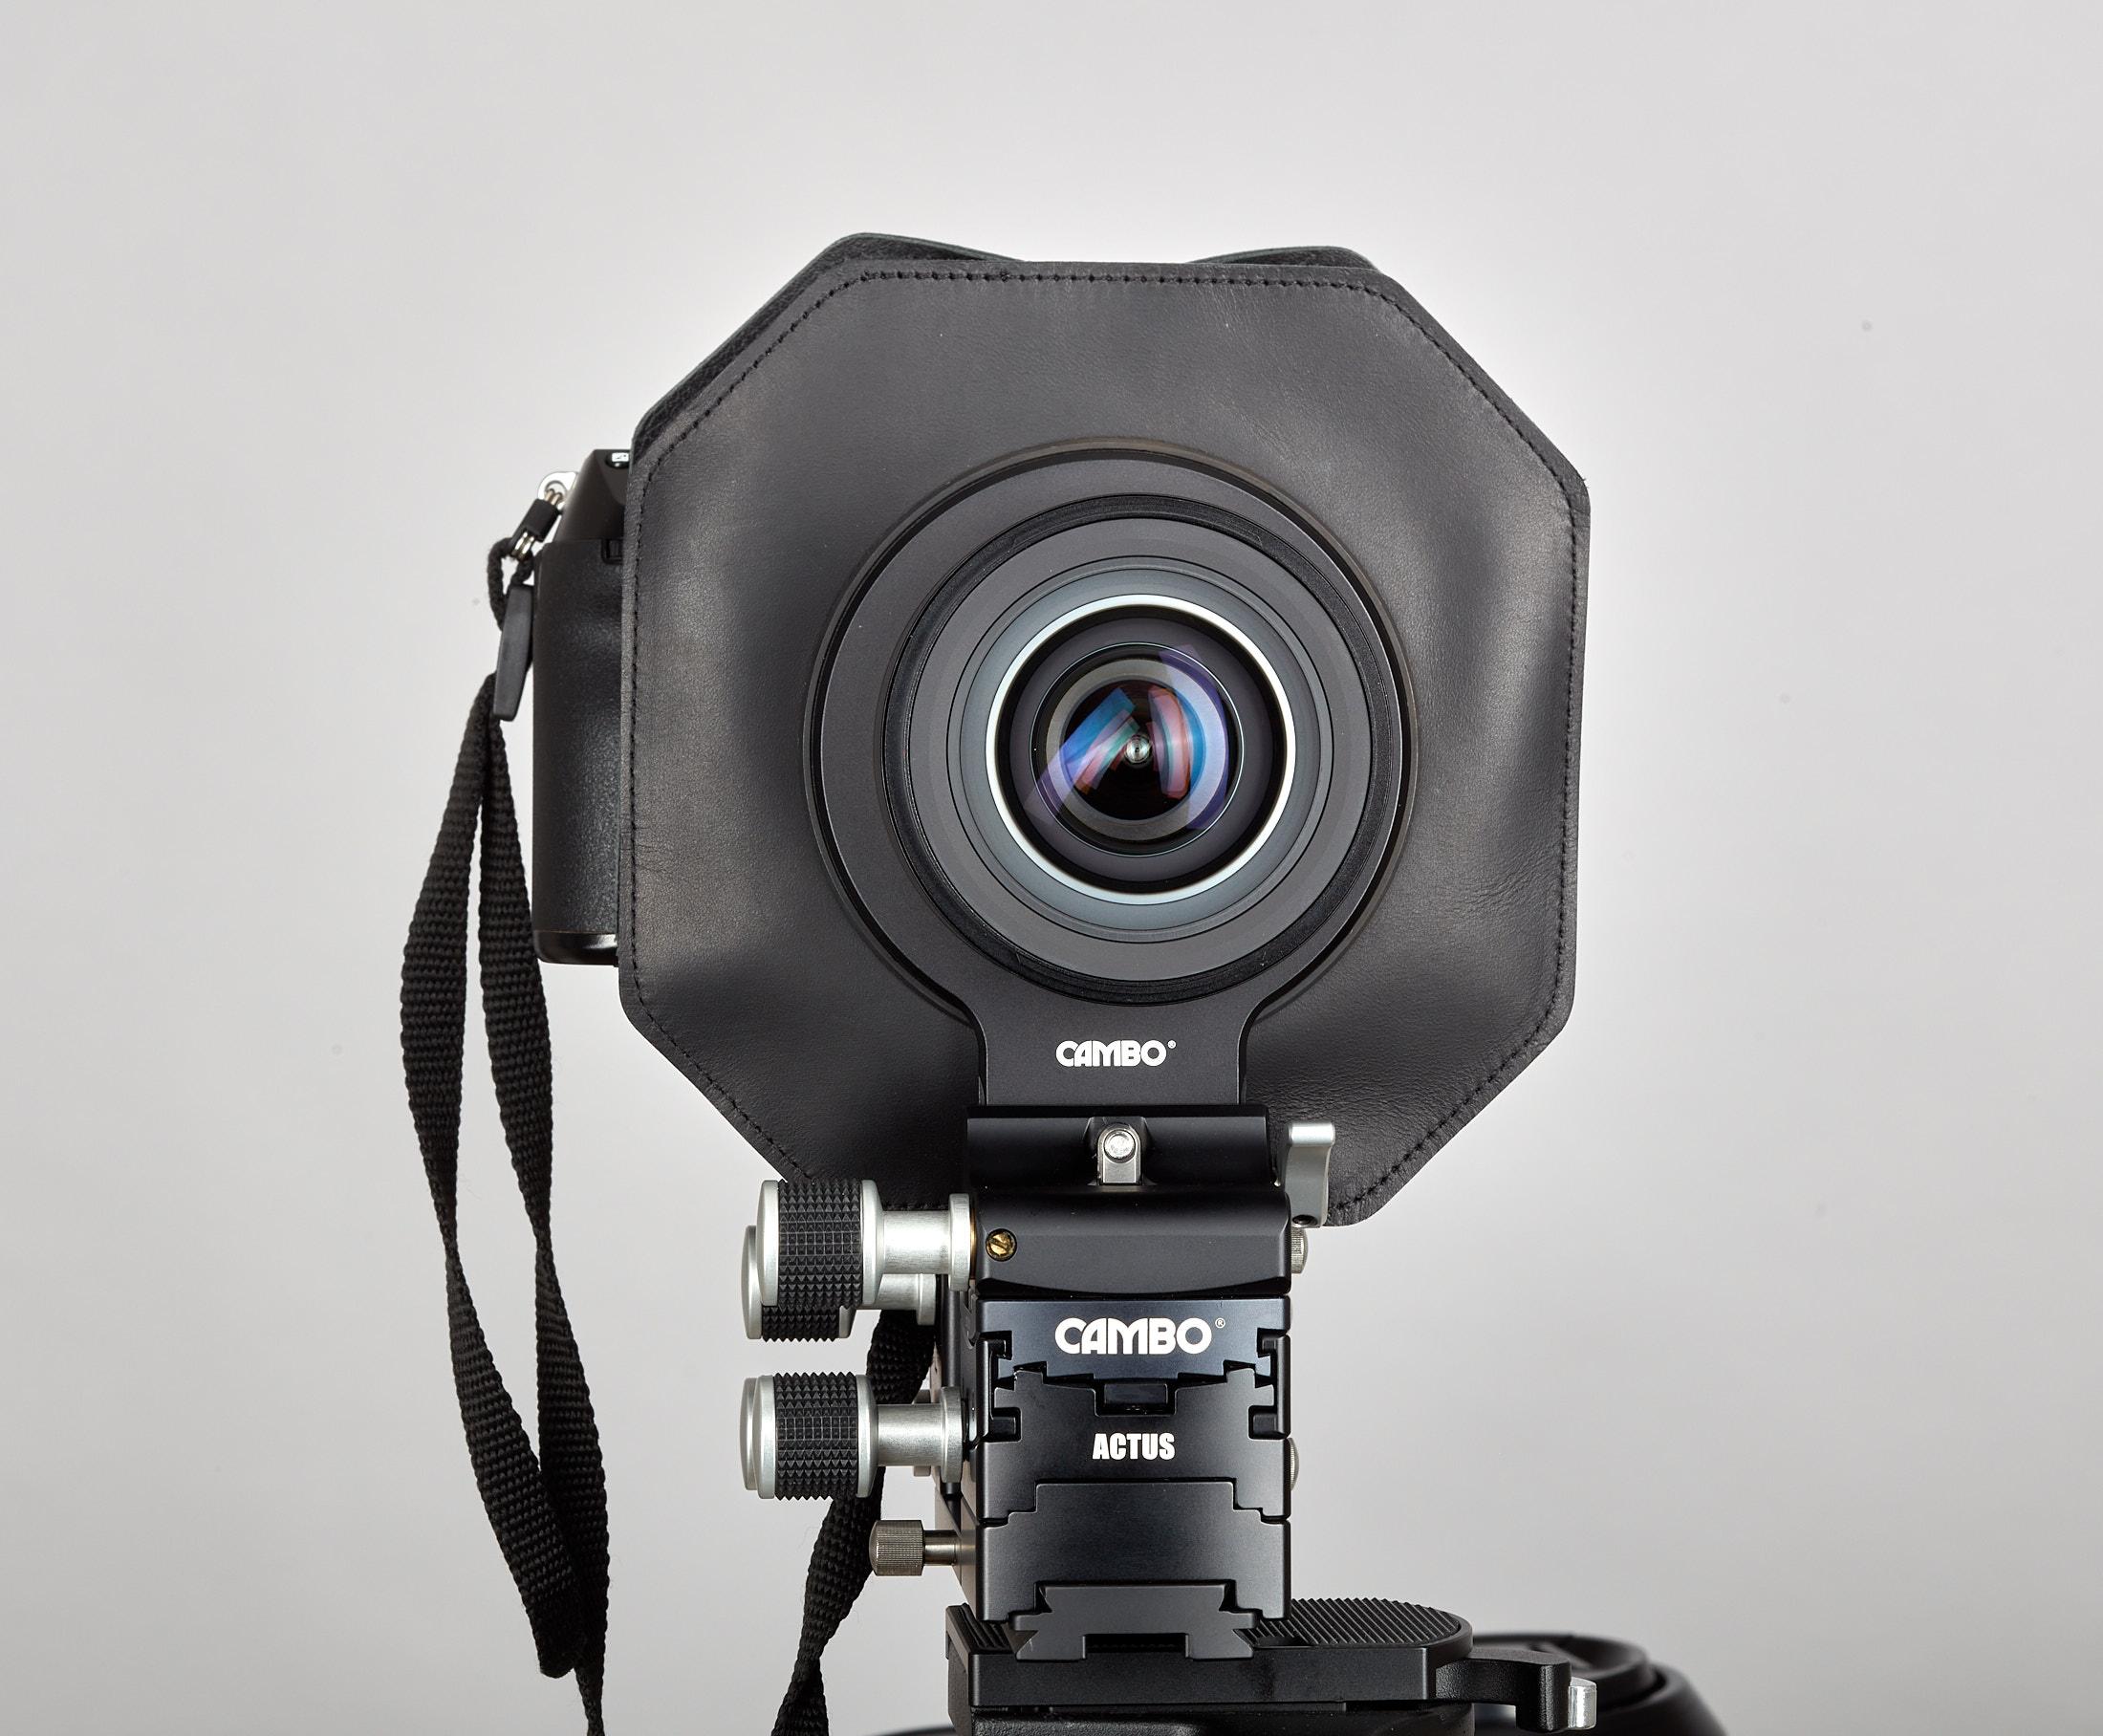 Cambo Actus movements lens rotation